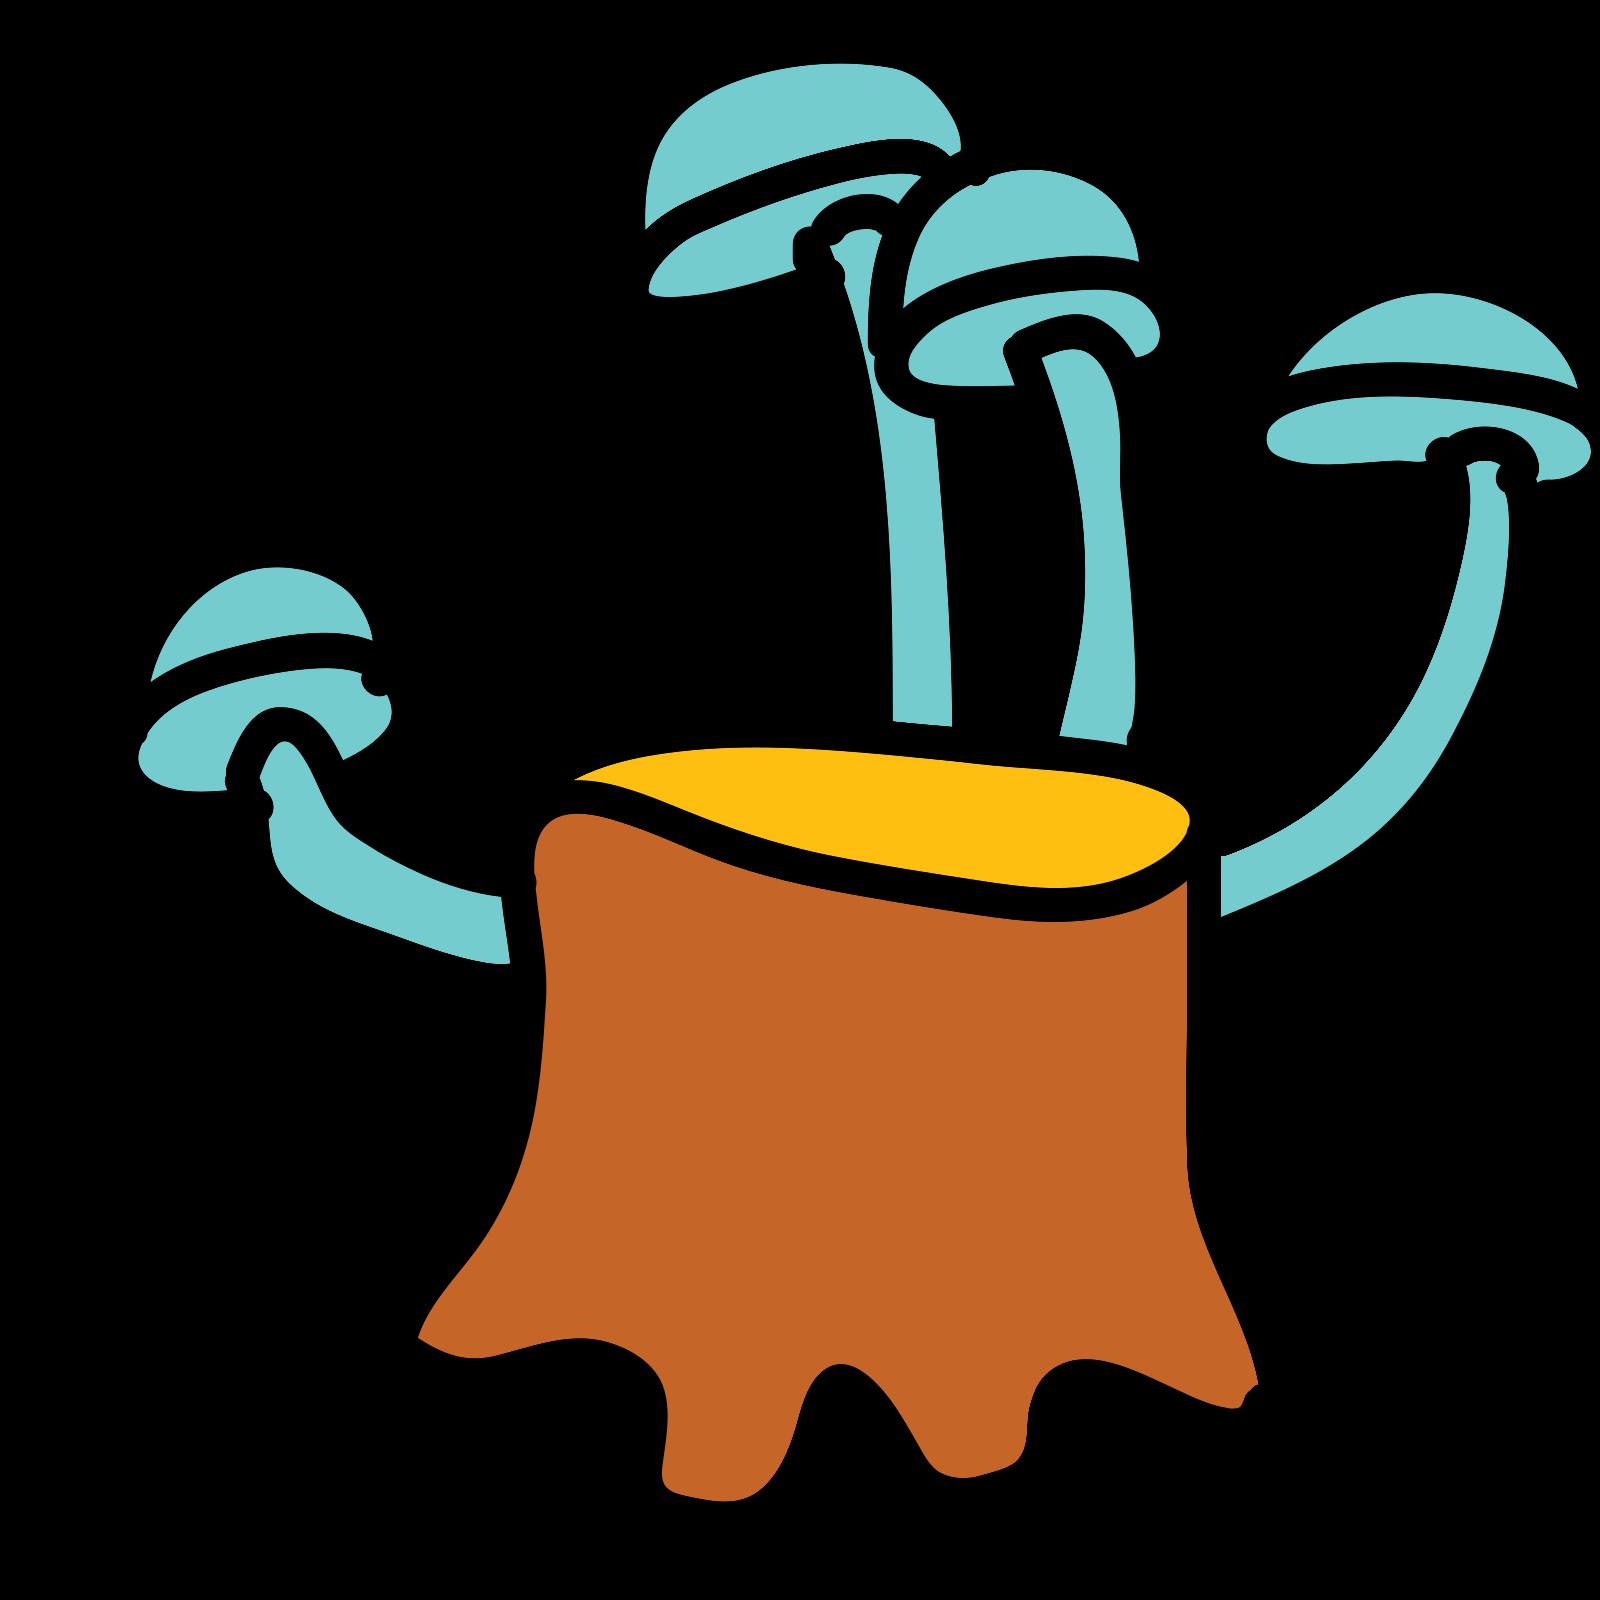 Shrooms icon